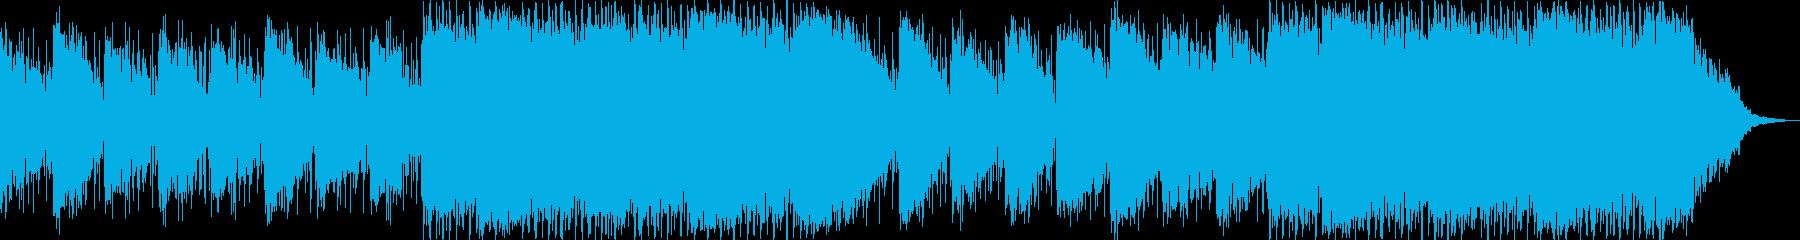 Inspiring Ambient 2の再生済みの波形